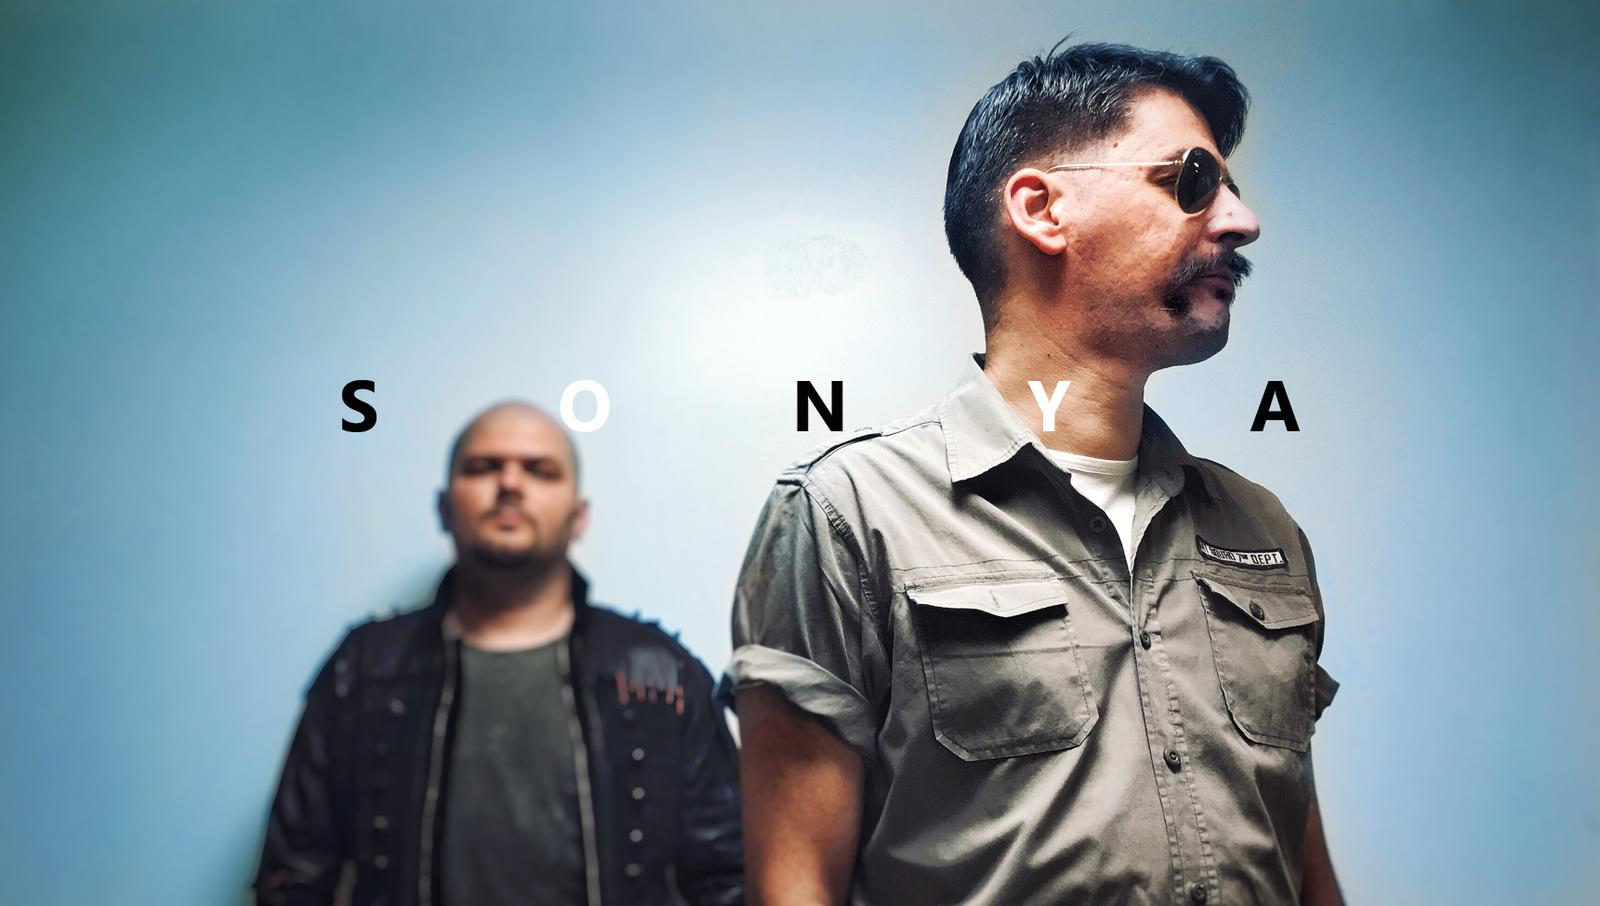 SONYA – novi splitski rock dvojac spreman za osvajanje